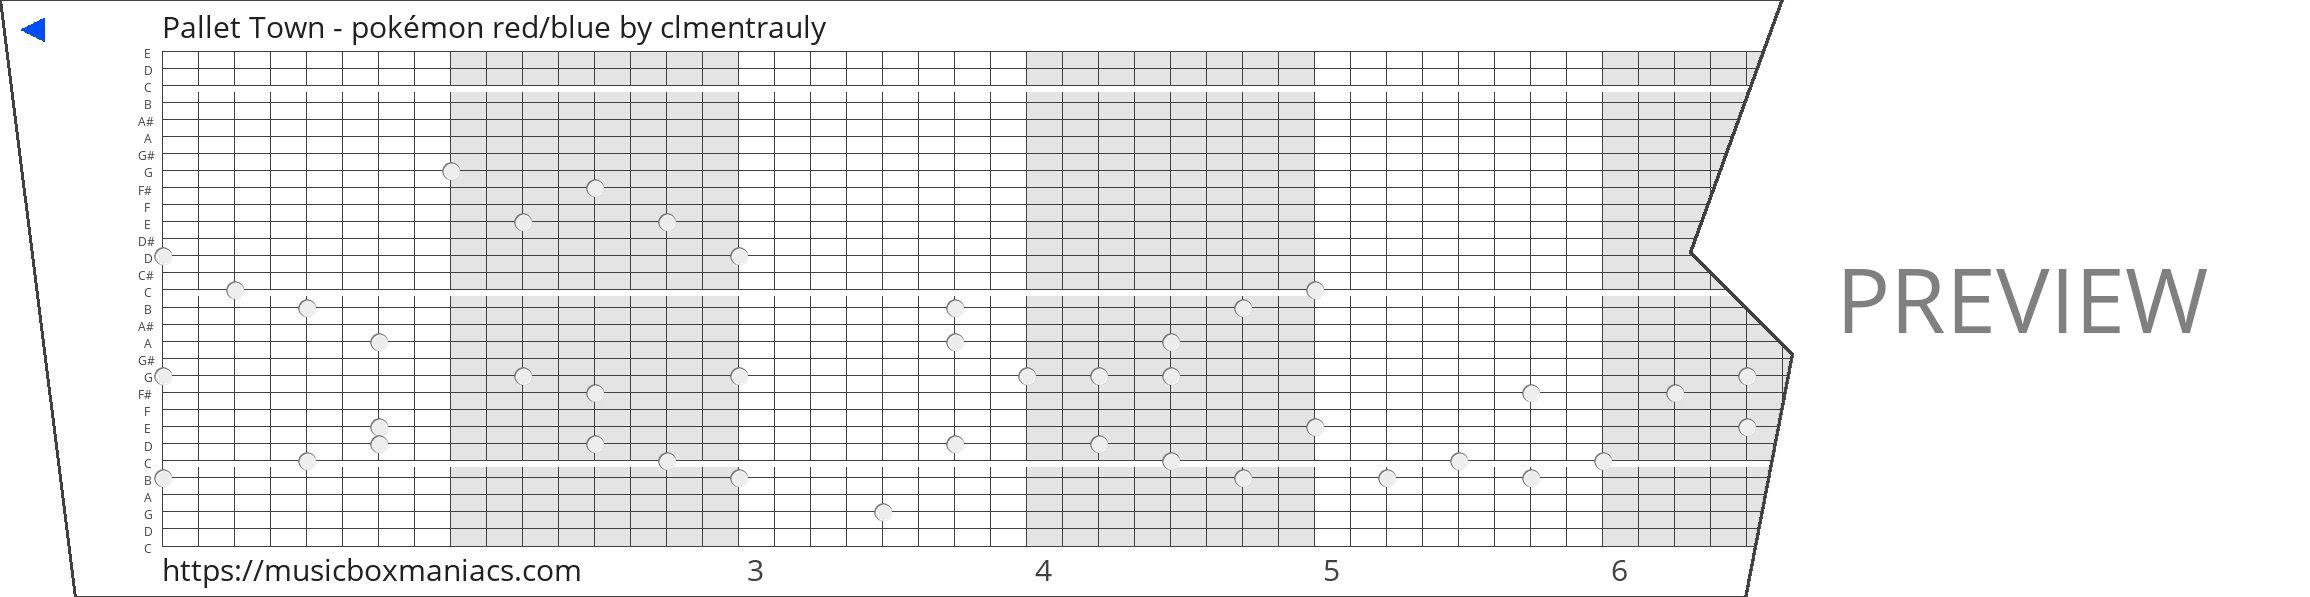 Pallet Town - pokémon red/blue 30 note music box paper strip